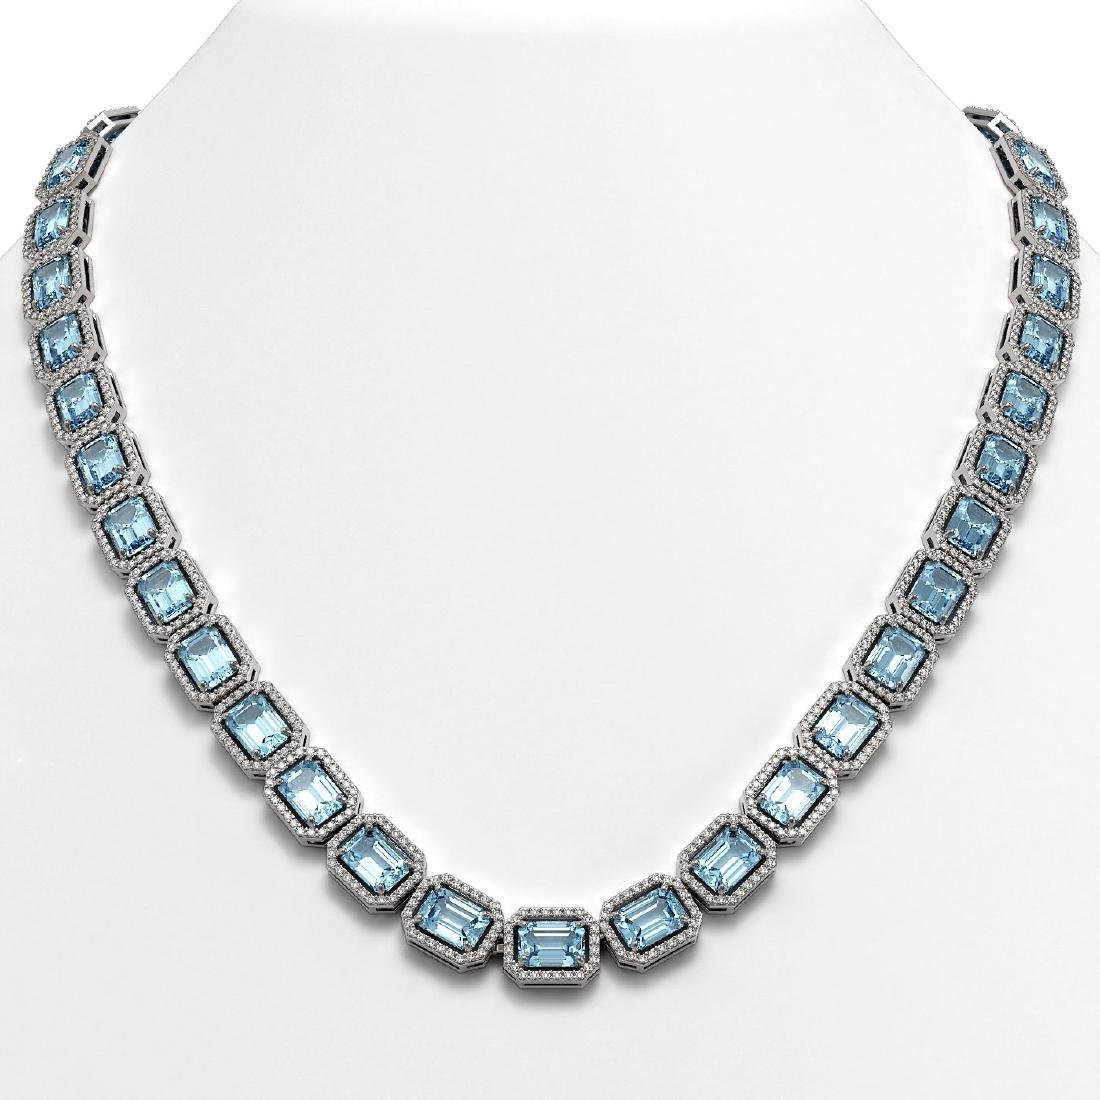 54.79 CTW Aquamarine & Diamond Halo Necklace 10K White